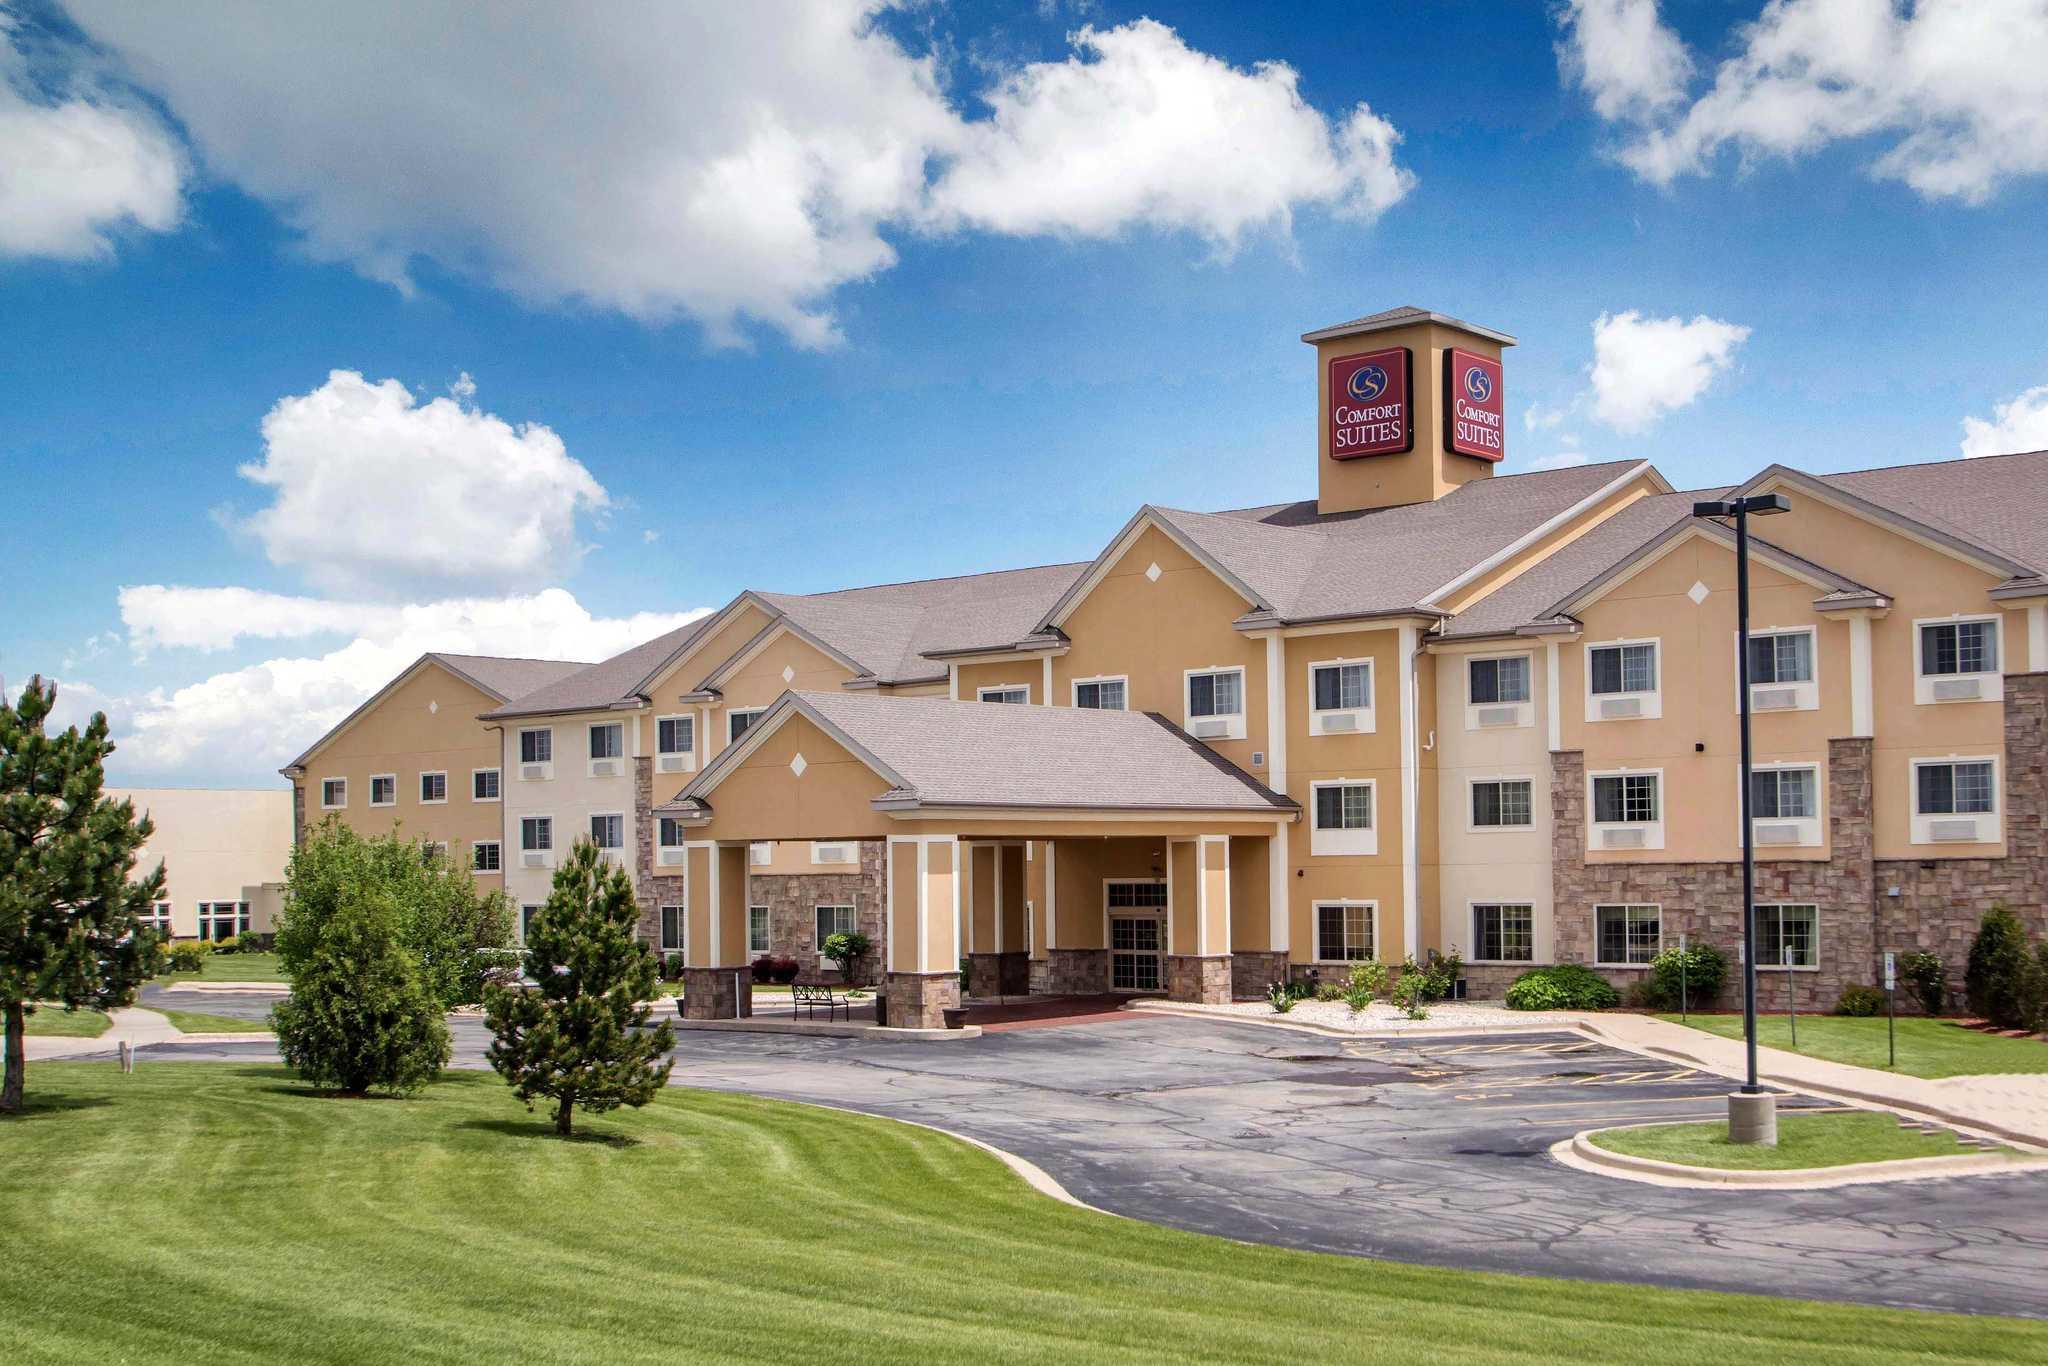 Comfort Suites Johnson Creek Conference Center image 0